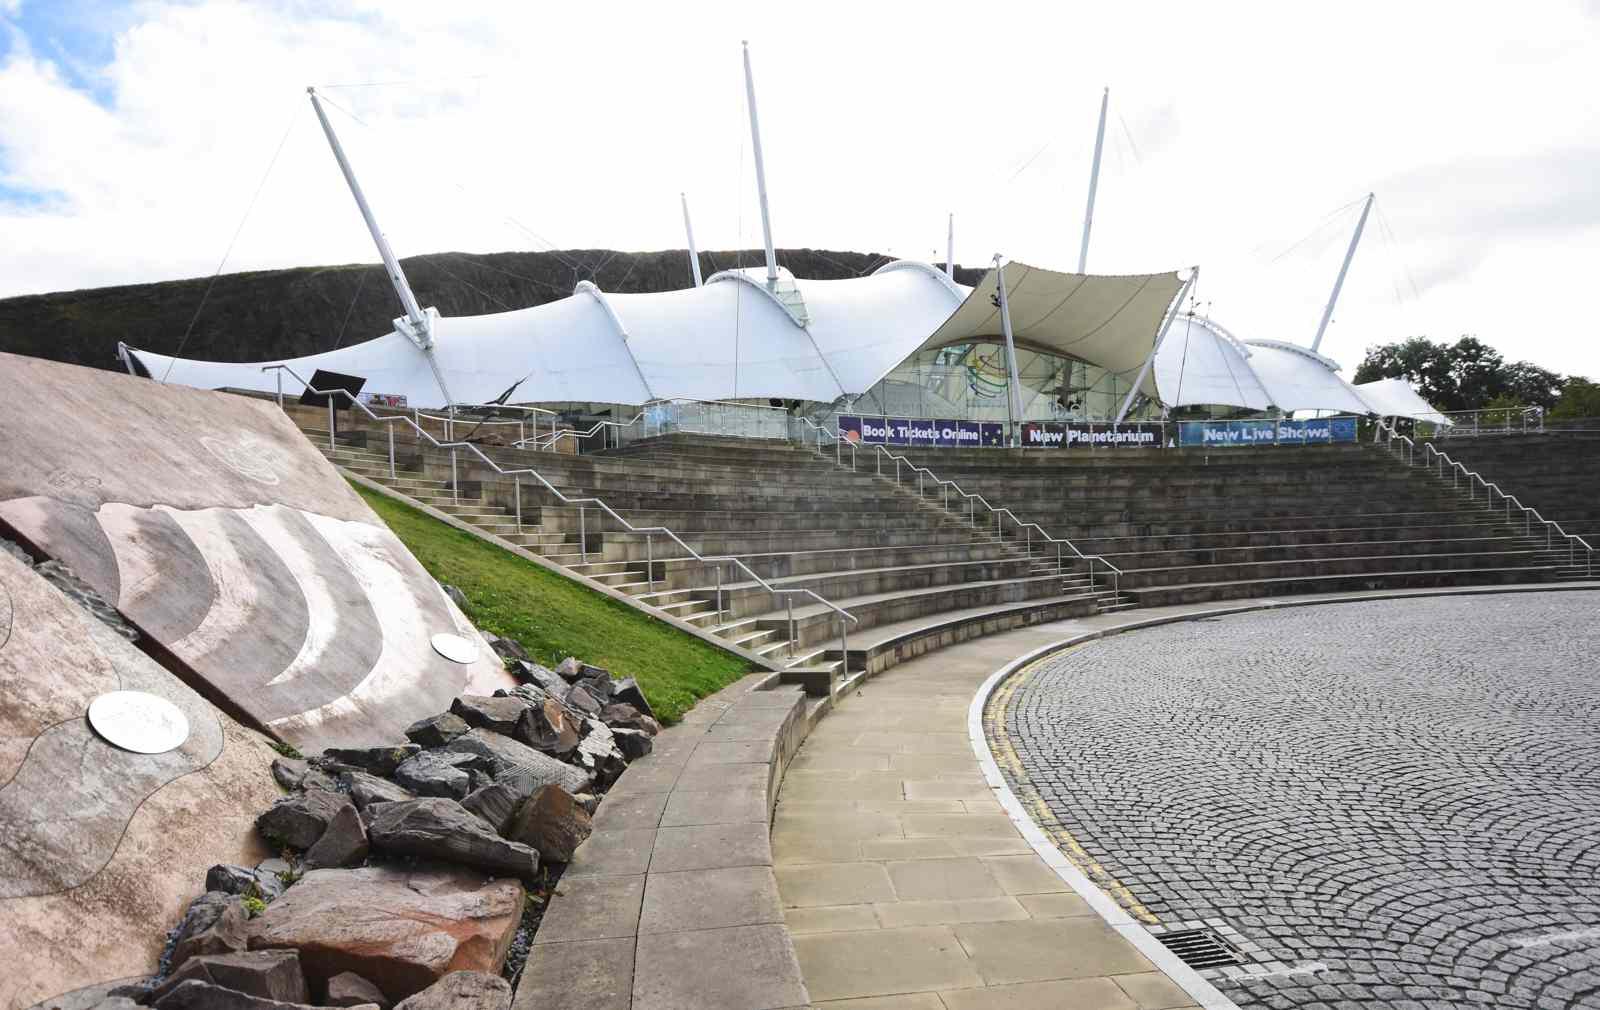 The Dynamic Earth Museum in Edinburgh, Scotland